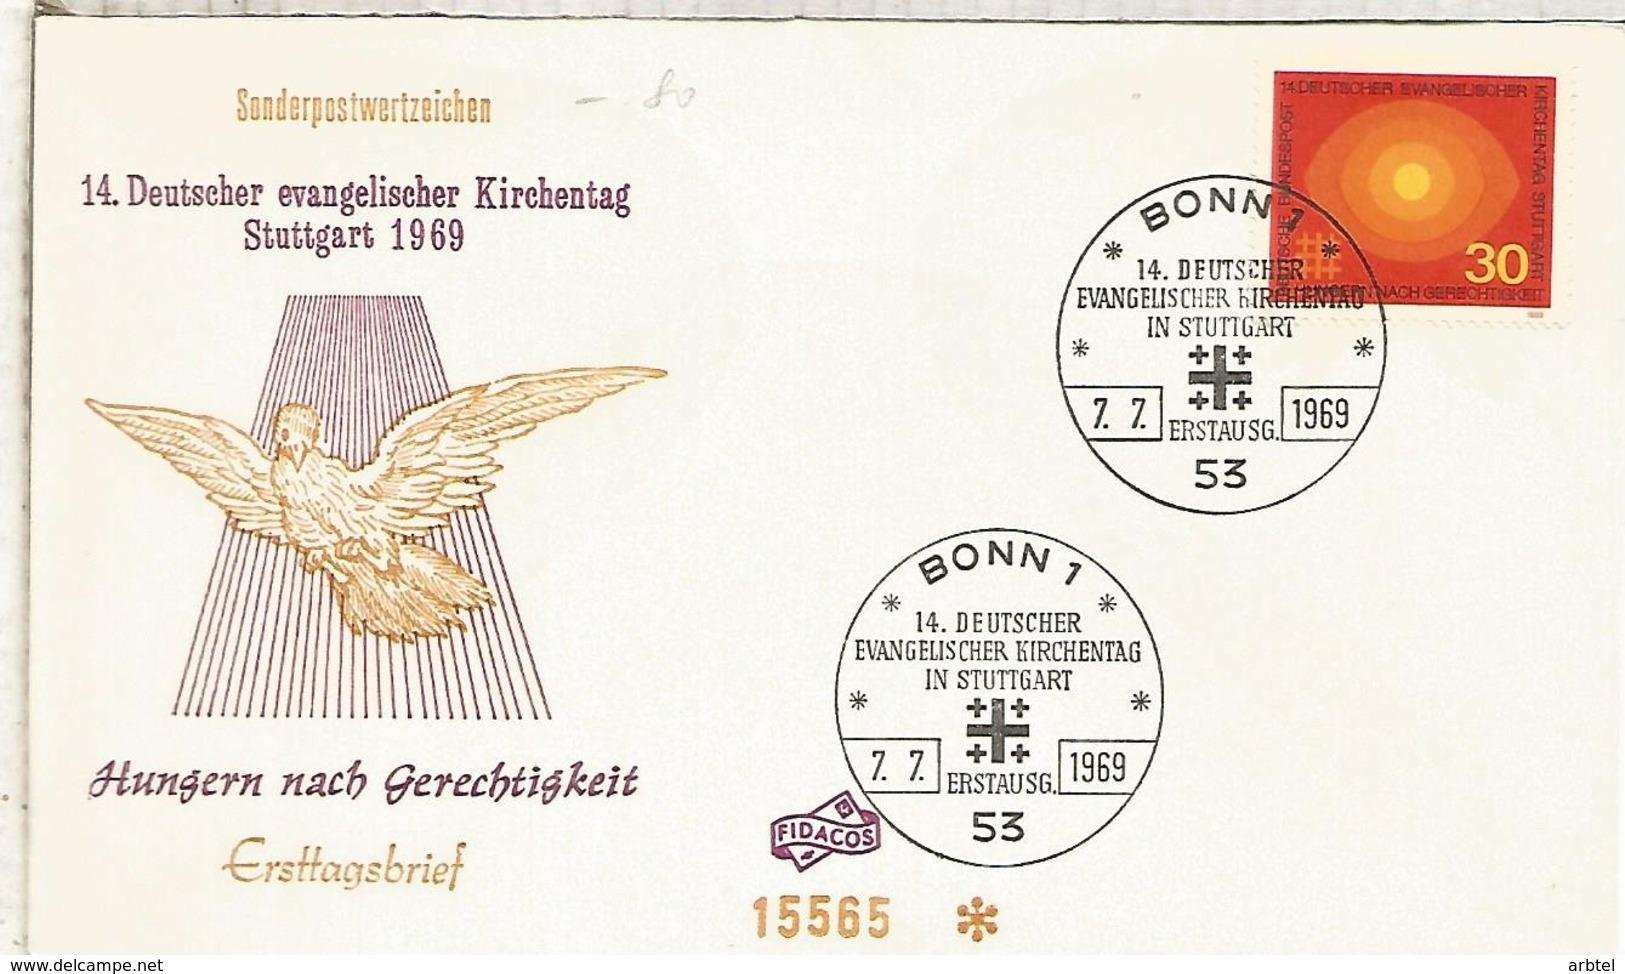 ALEMANIA FDC BONN 1969 RELIGION - Cristianismo